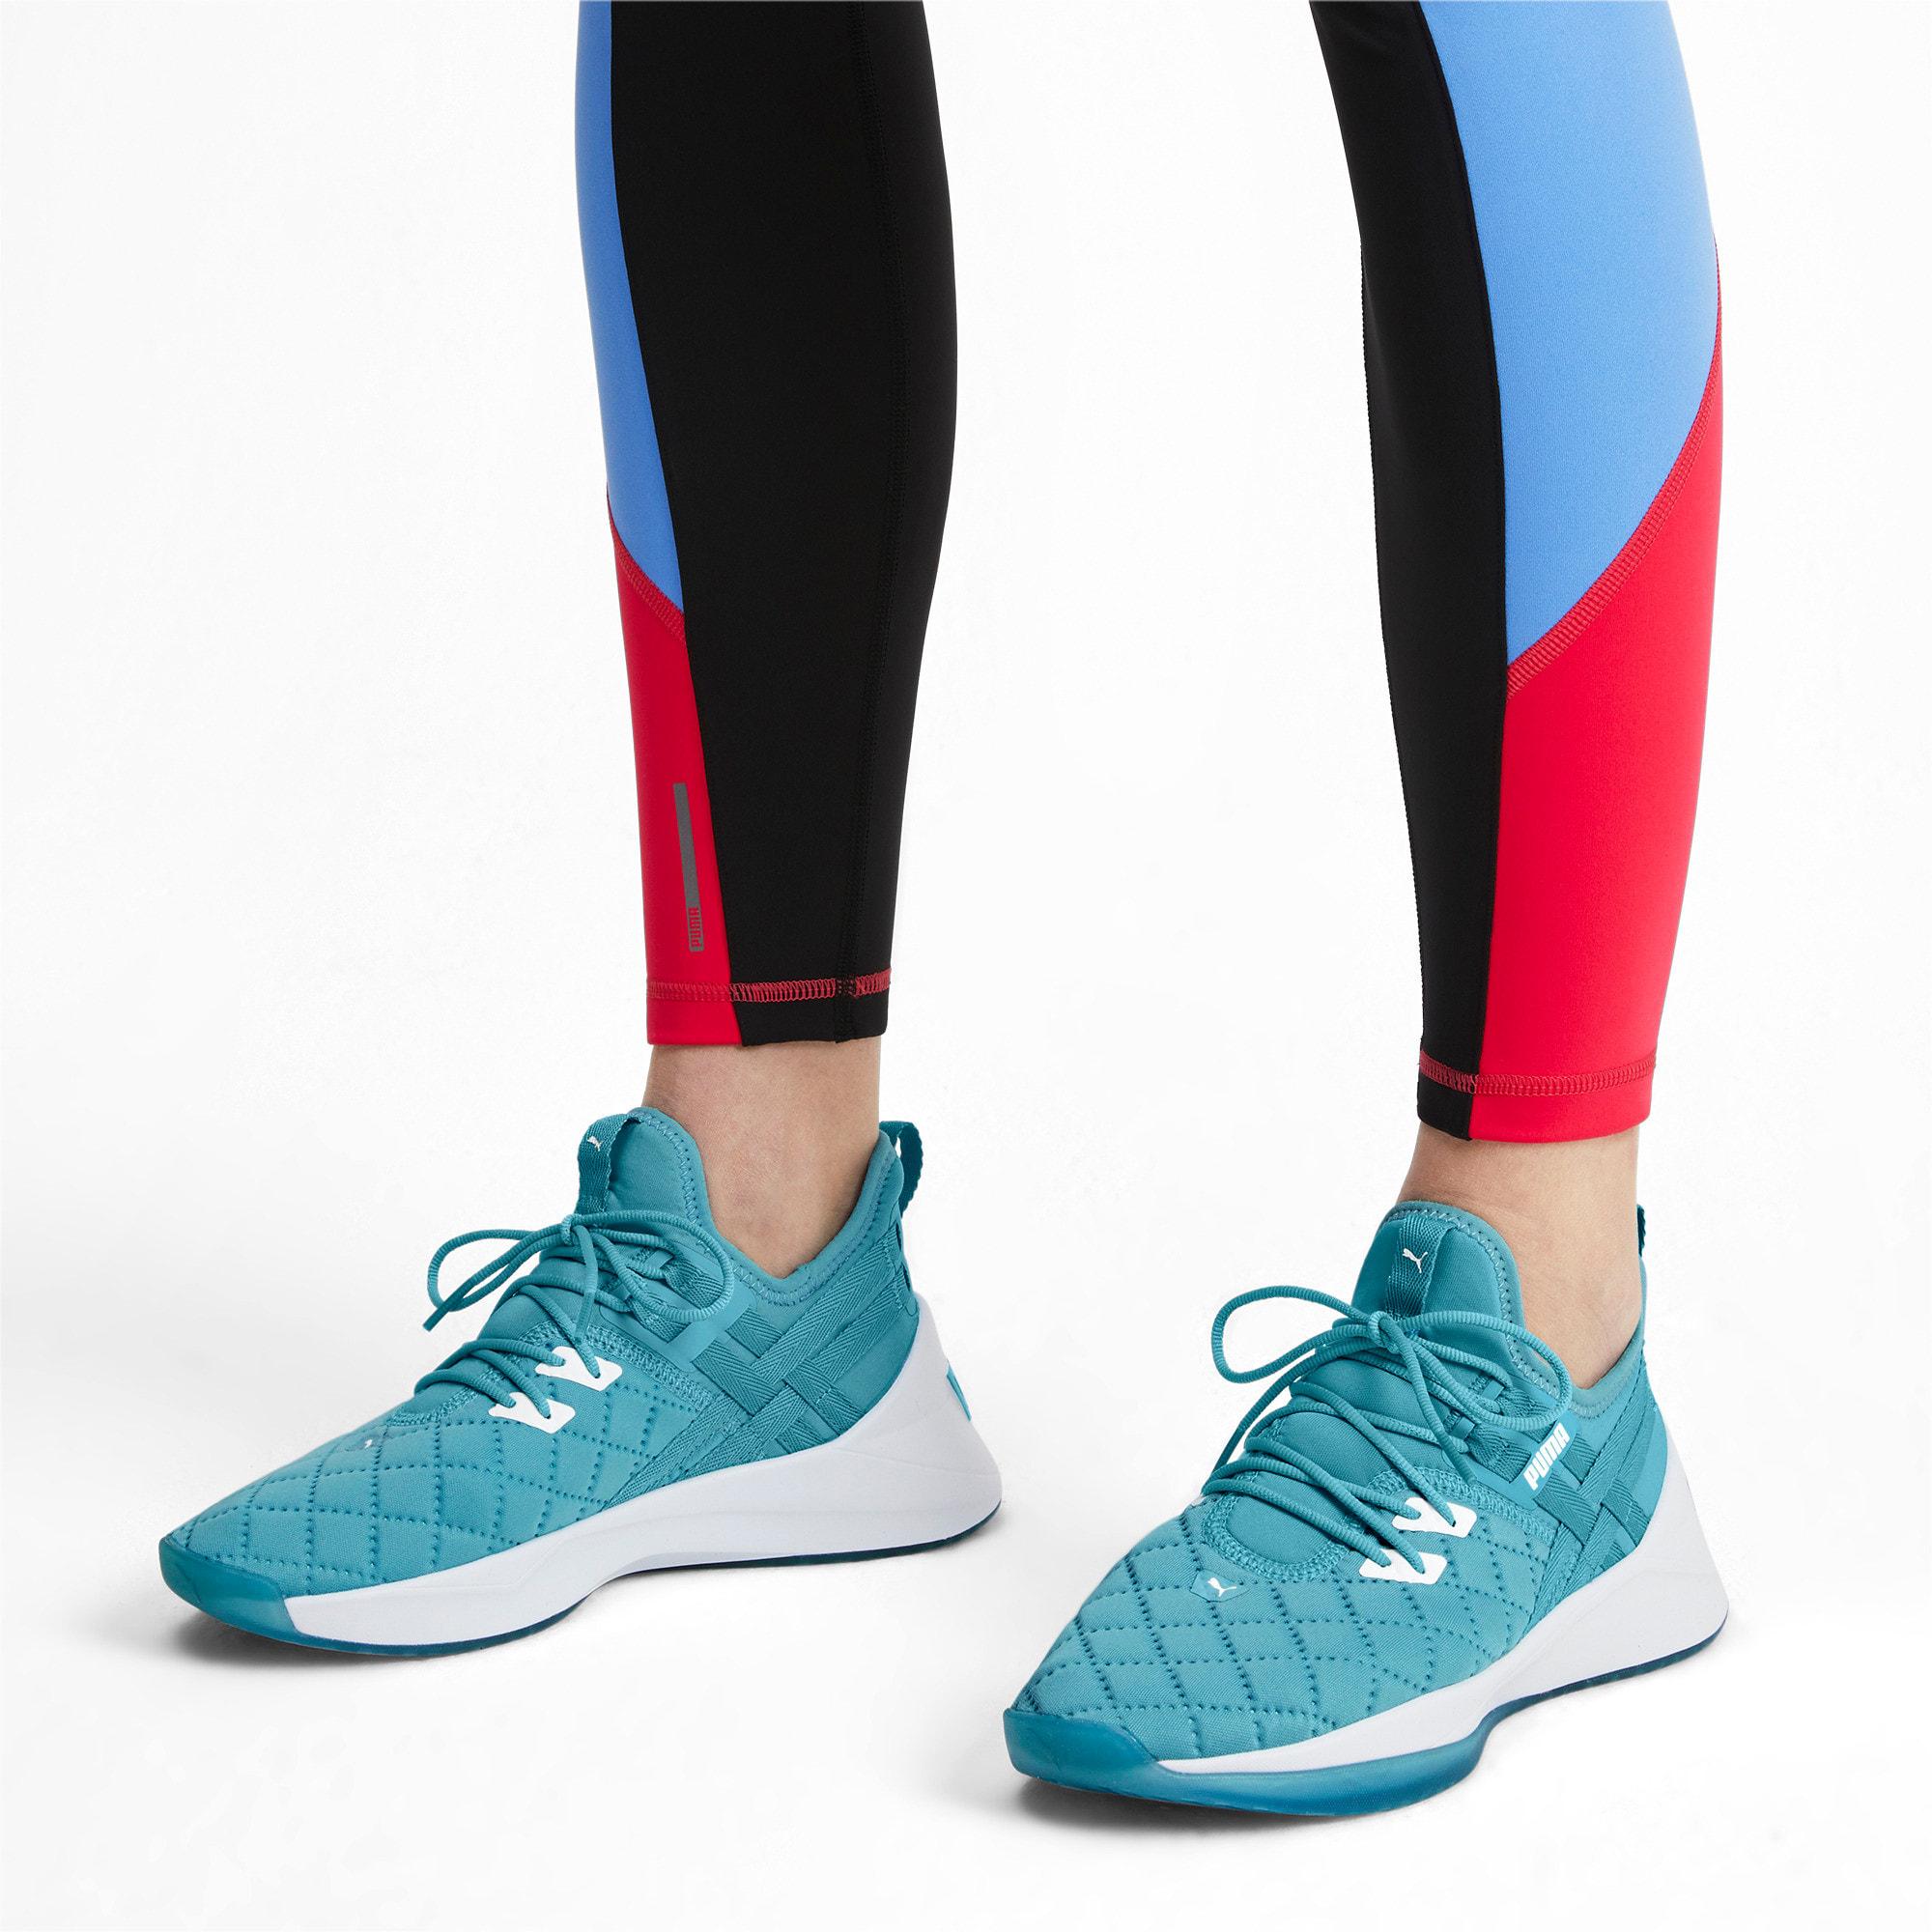 Thumbnail 3 of Jaab XT Quilt Women's Training Shoes, Milky Blue-Puma White, medium